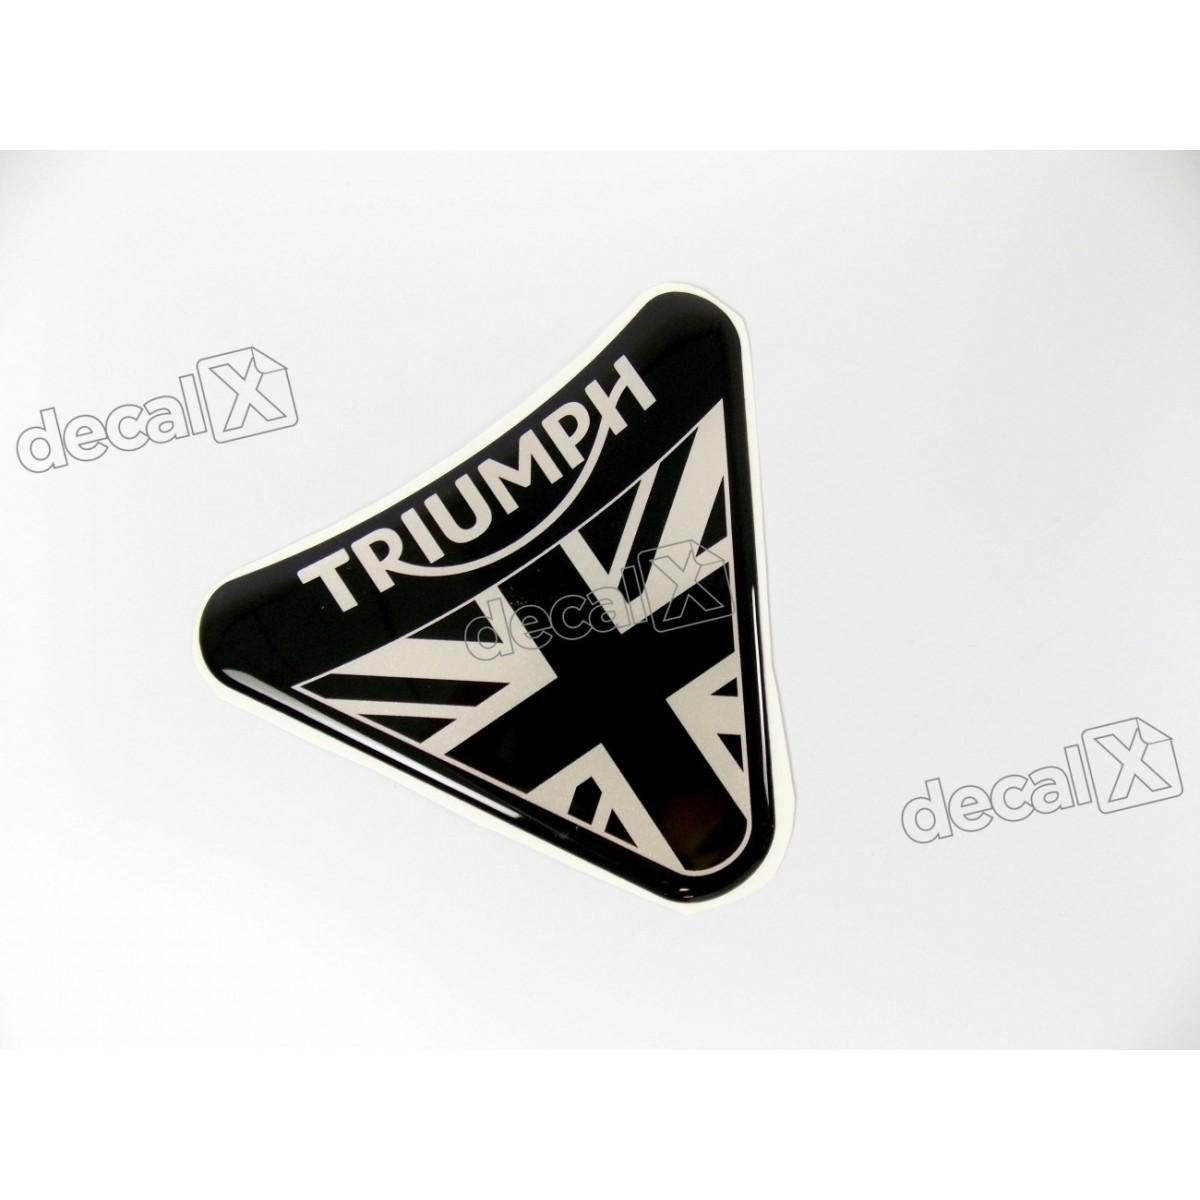 Adesivo Escudo Triumph Resinado 7,5x9,0 Cms Preto Decalx